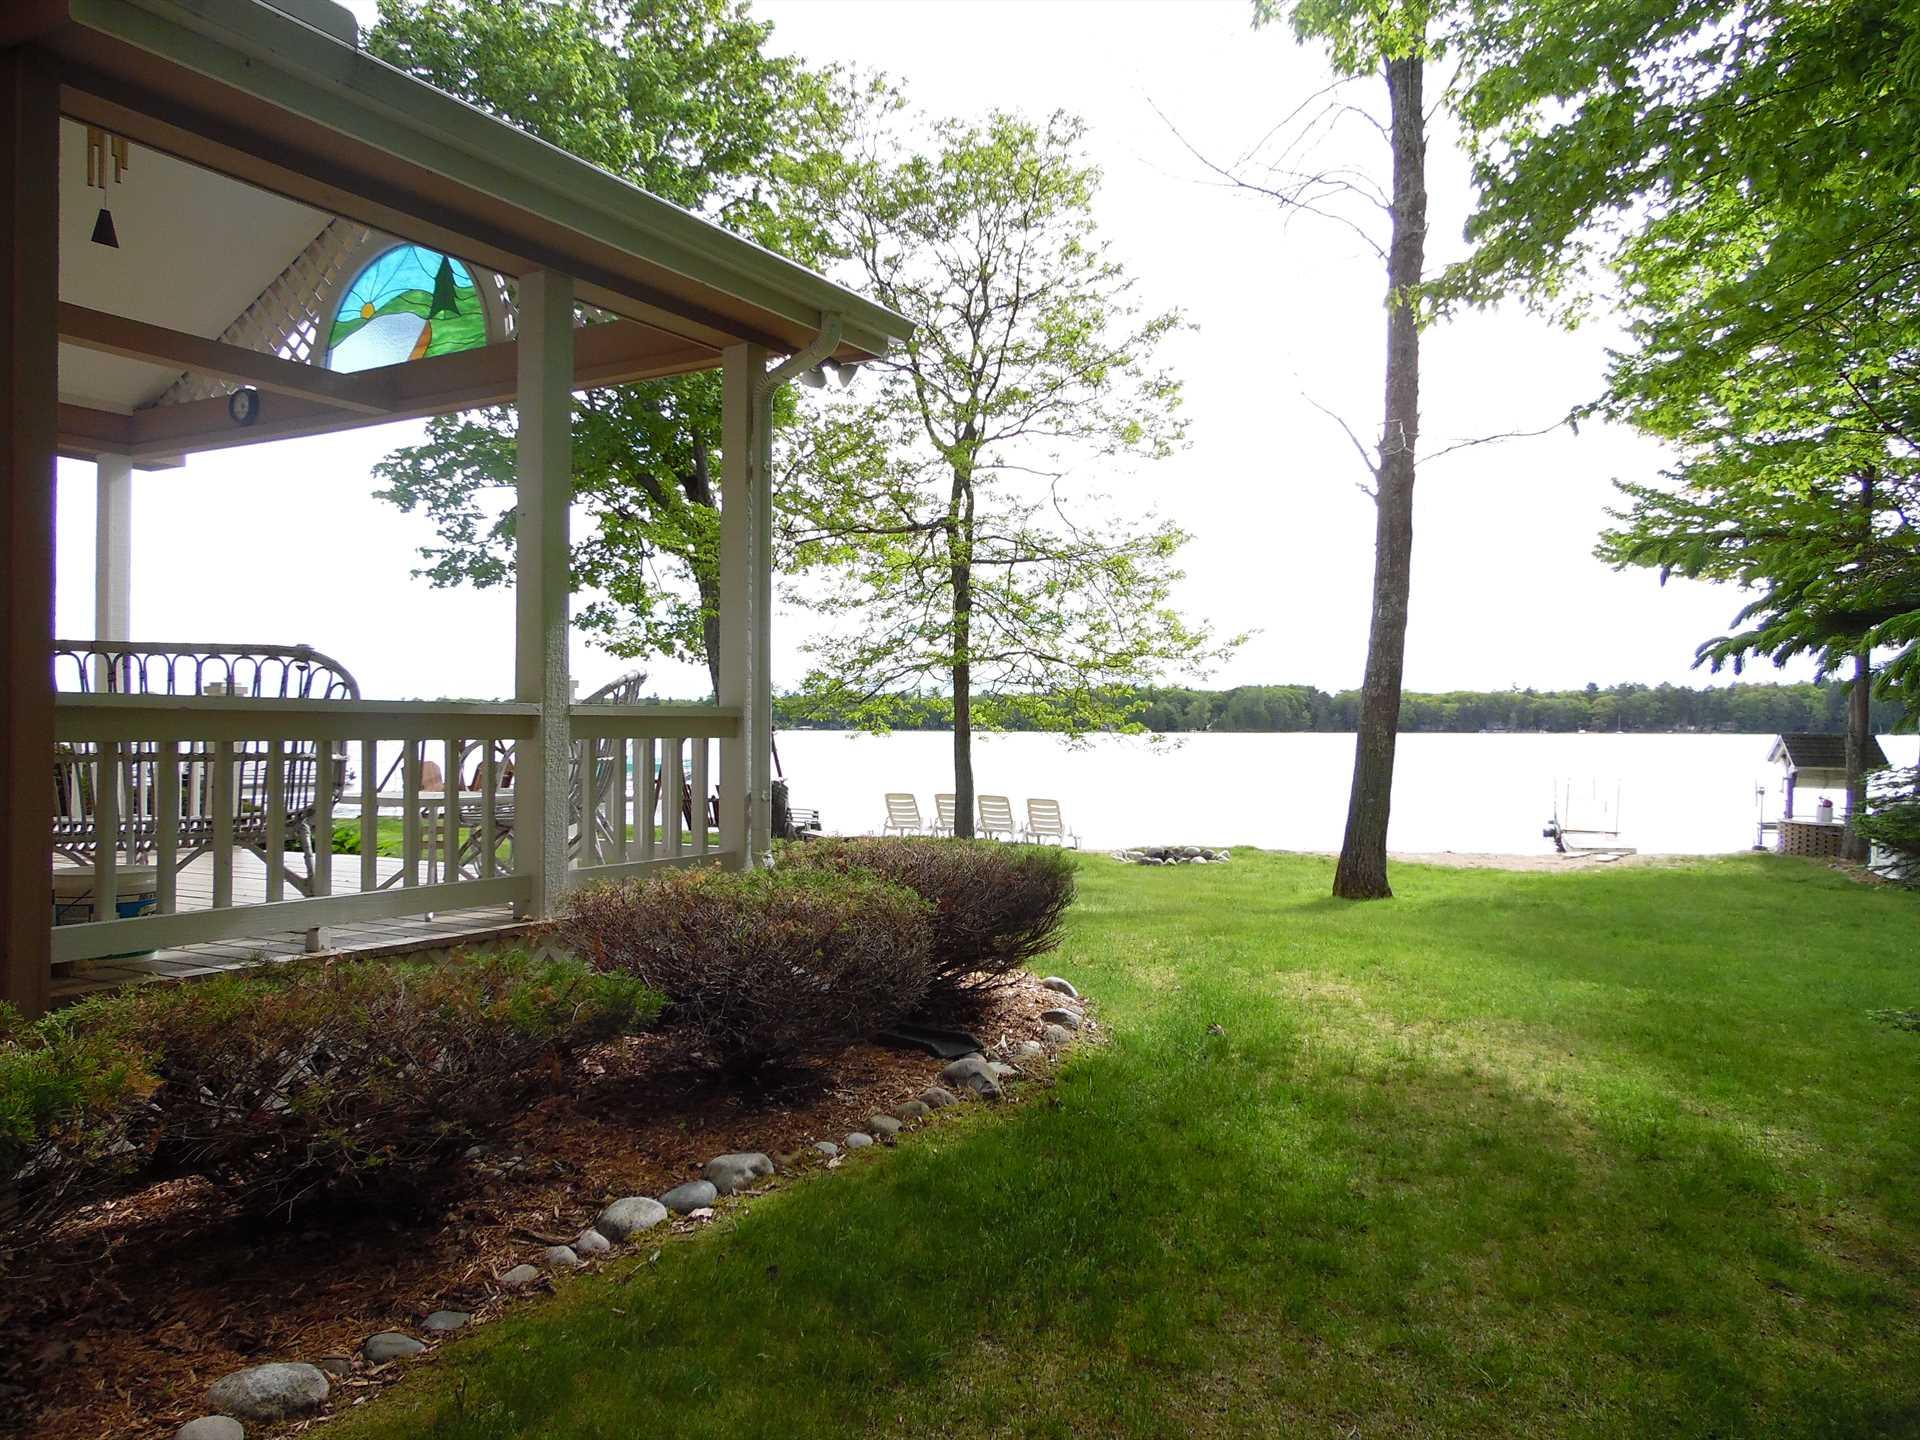 Perfect Landing Rentals Real Estate Northeastern Tawas City Michigan Vacation Rental Home.